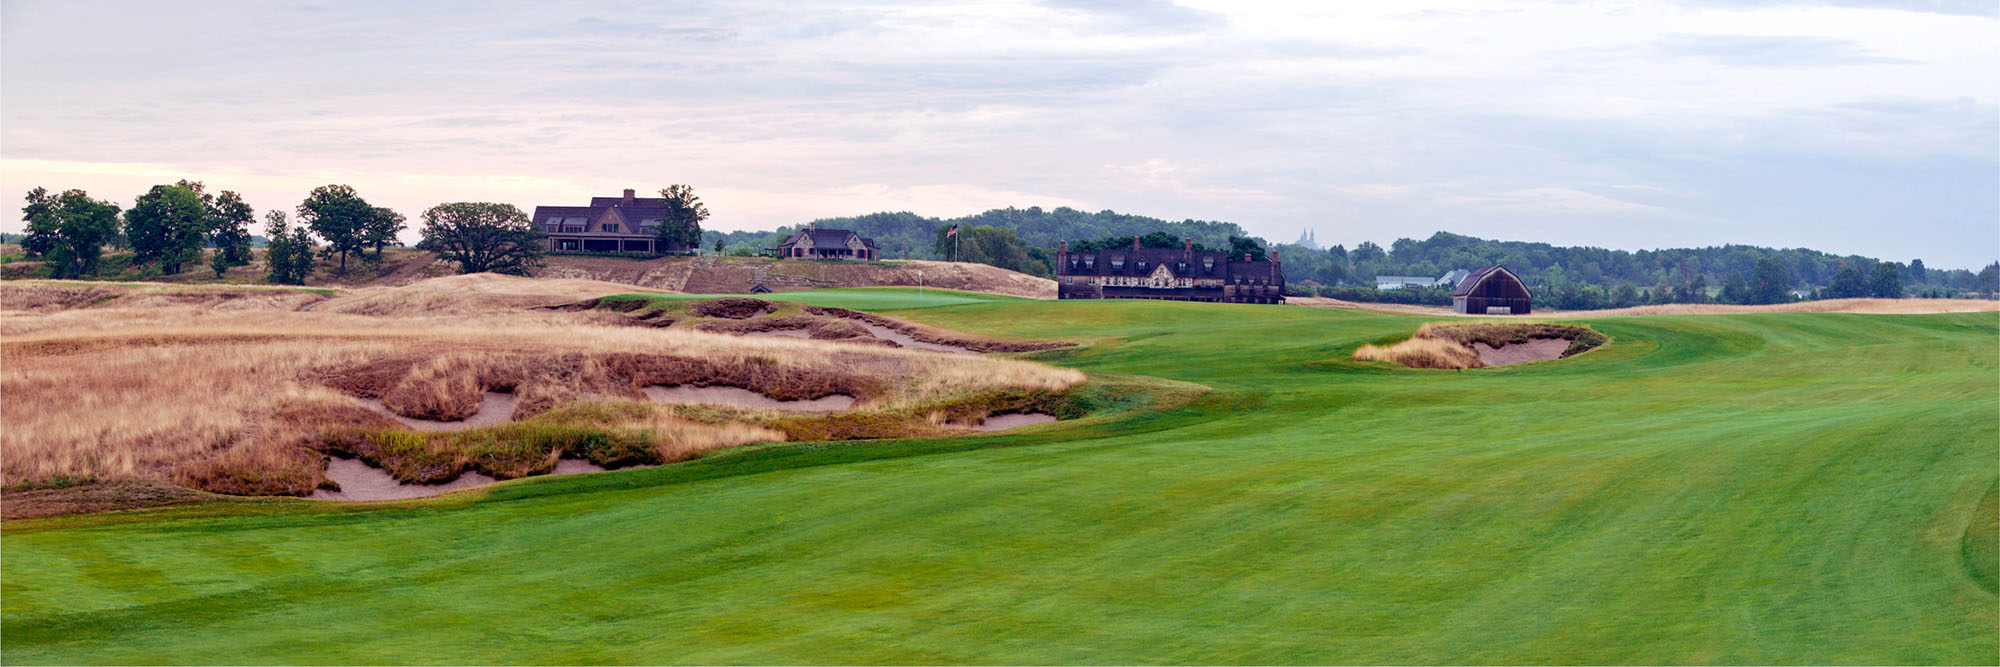 Golf Course Image - Erin Hills No. 18